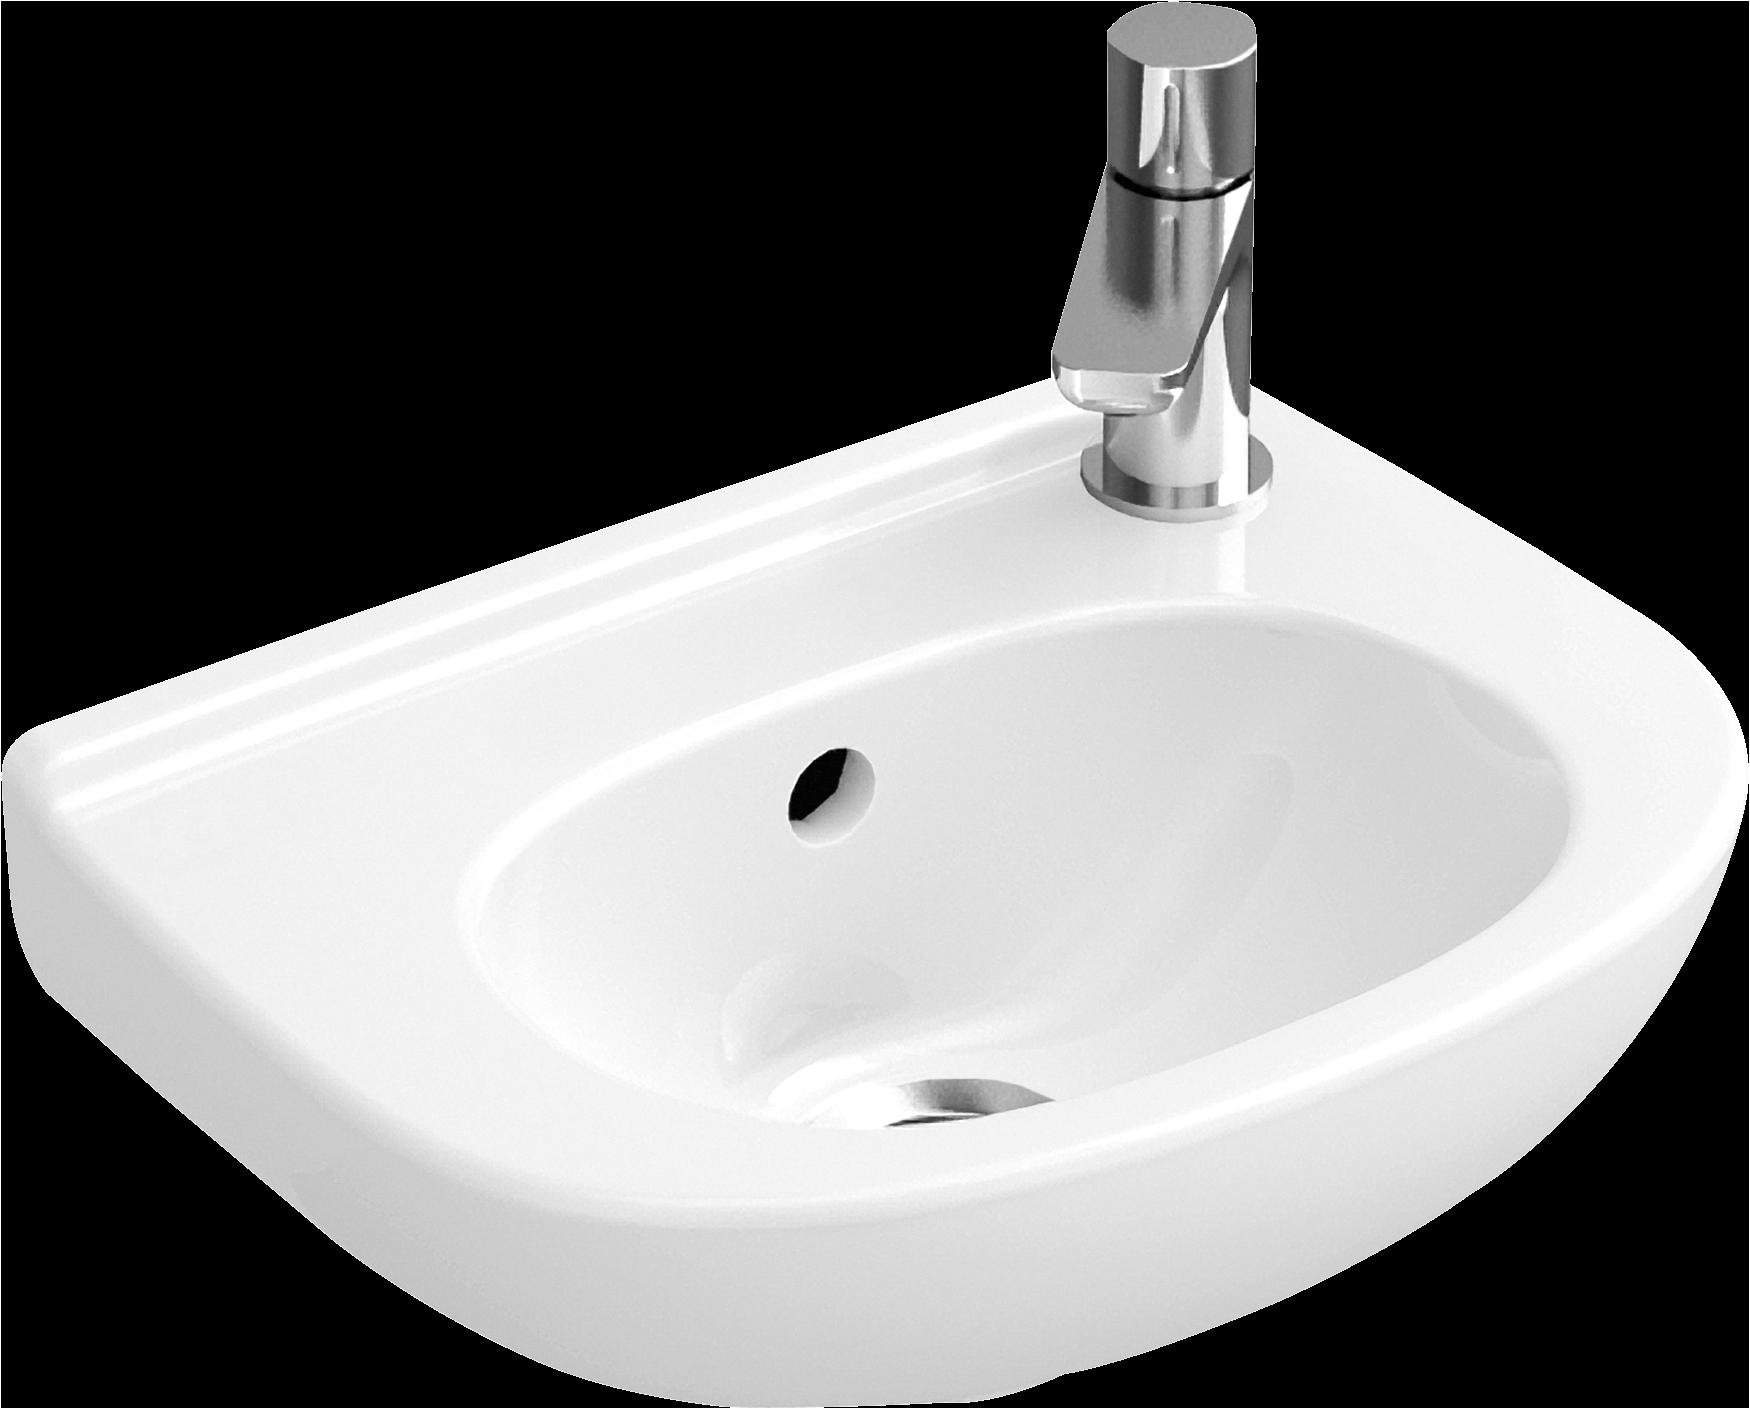 handwaschbecken compact oval 536038 villeroy boch. Black Bedroom Furniture Sets. Home Design Ideas